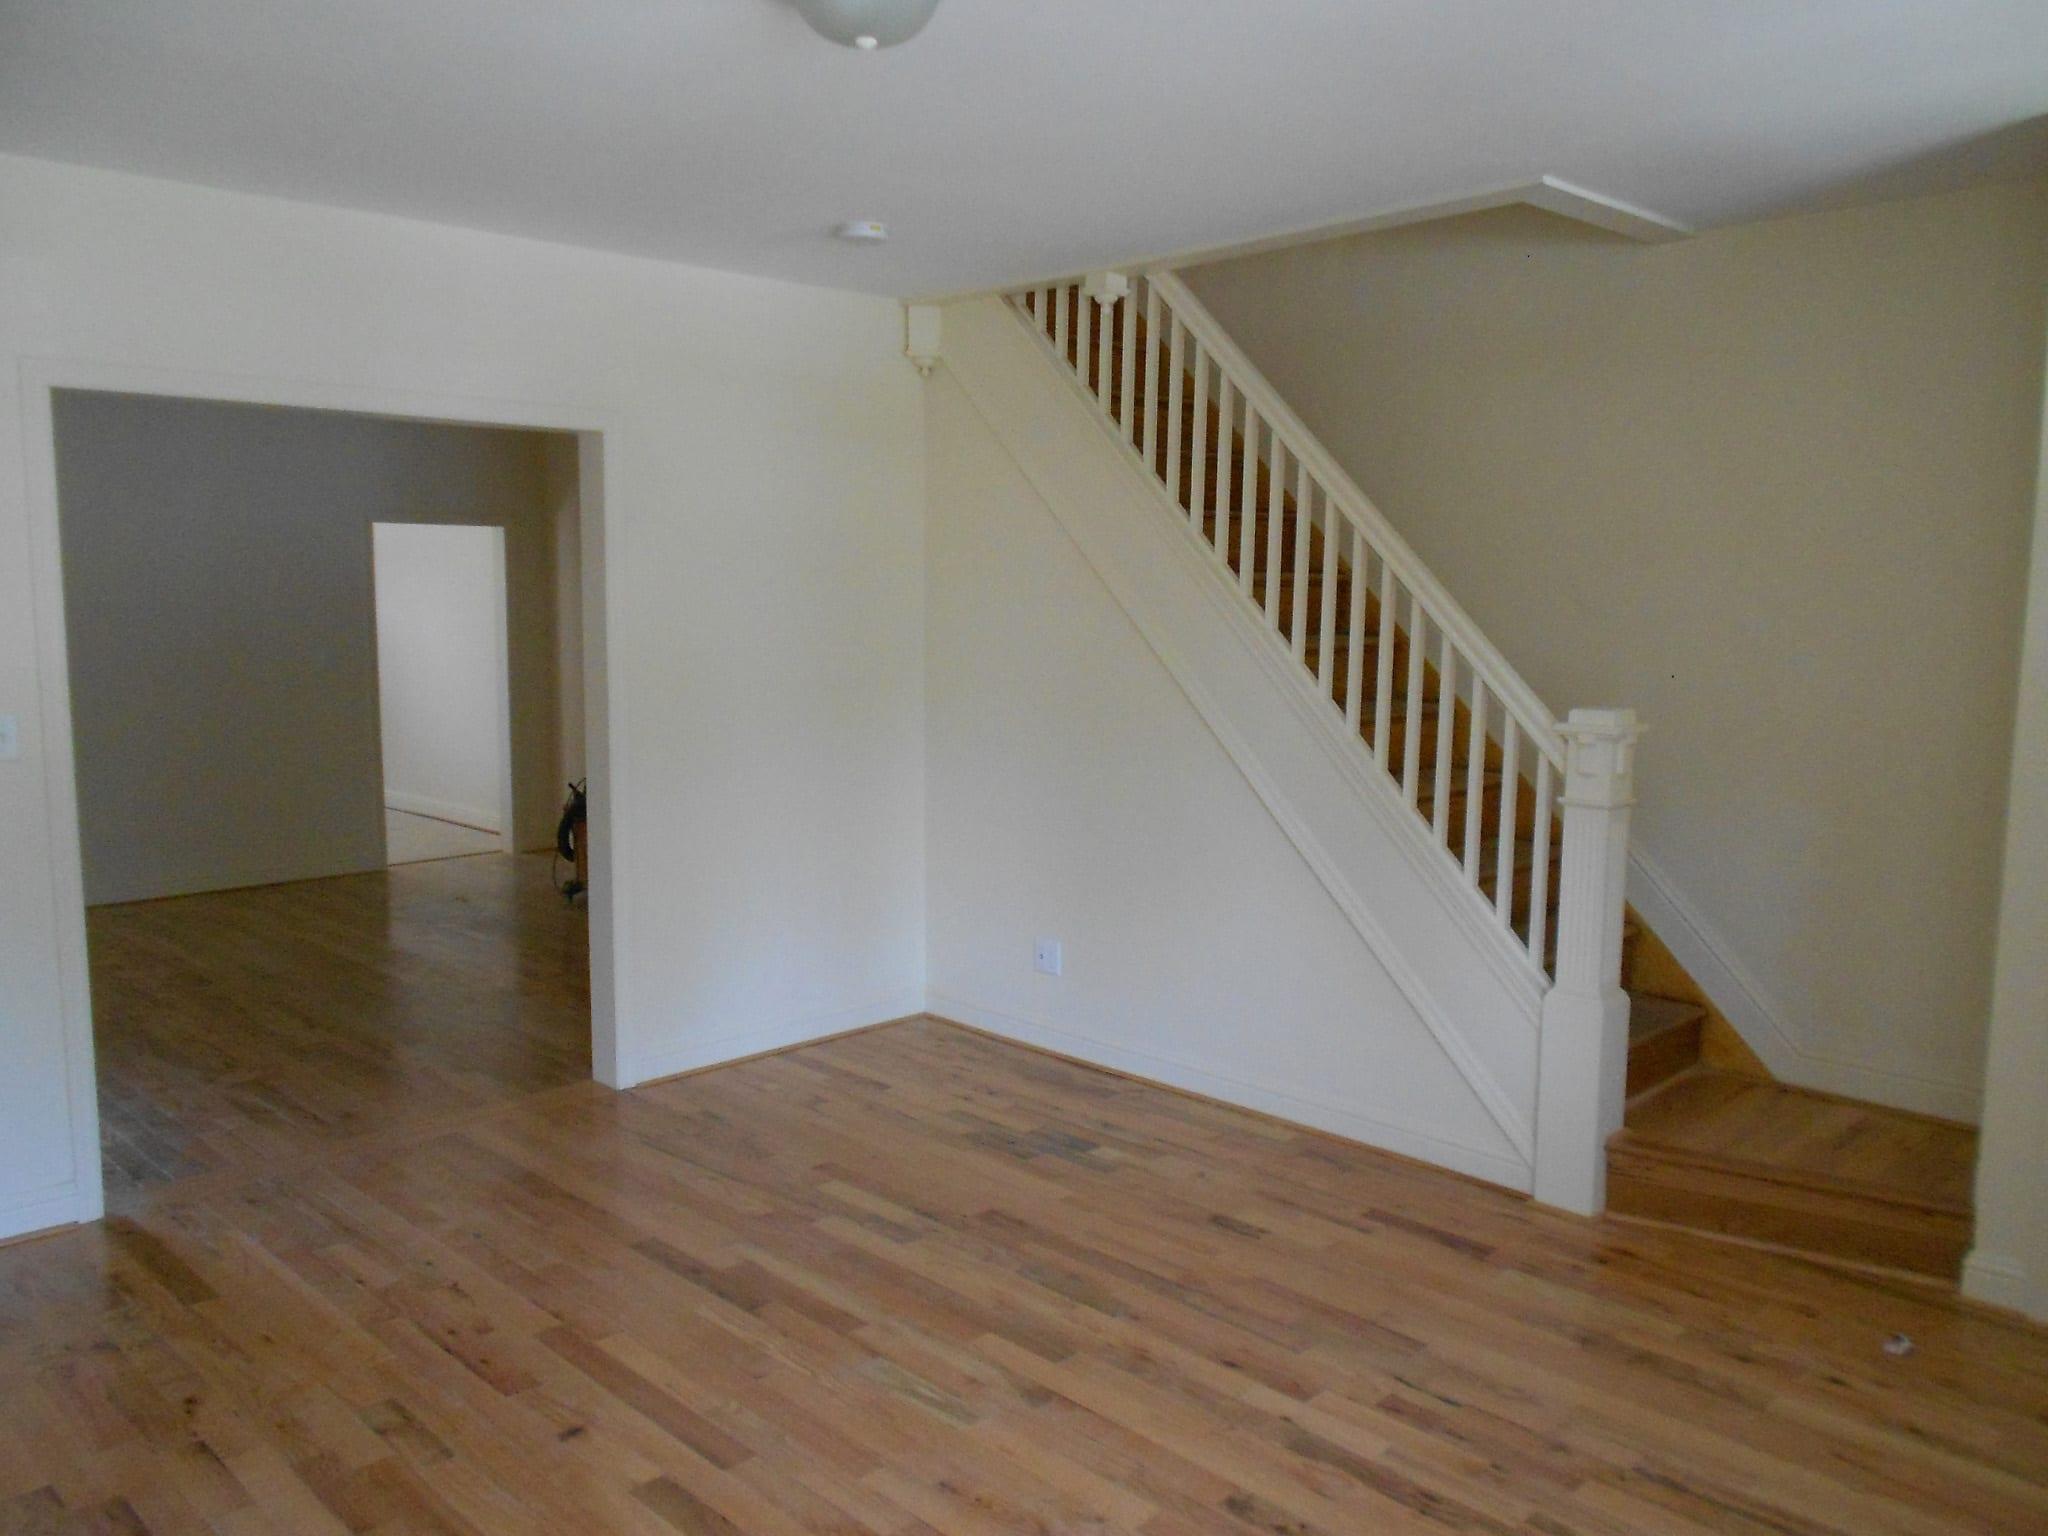 3534 Ellerslie Avenue – 3 Bedroom in Waverly/Ednor Gardens